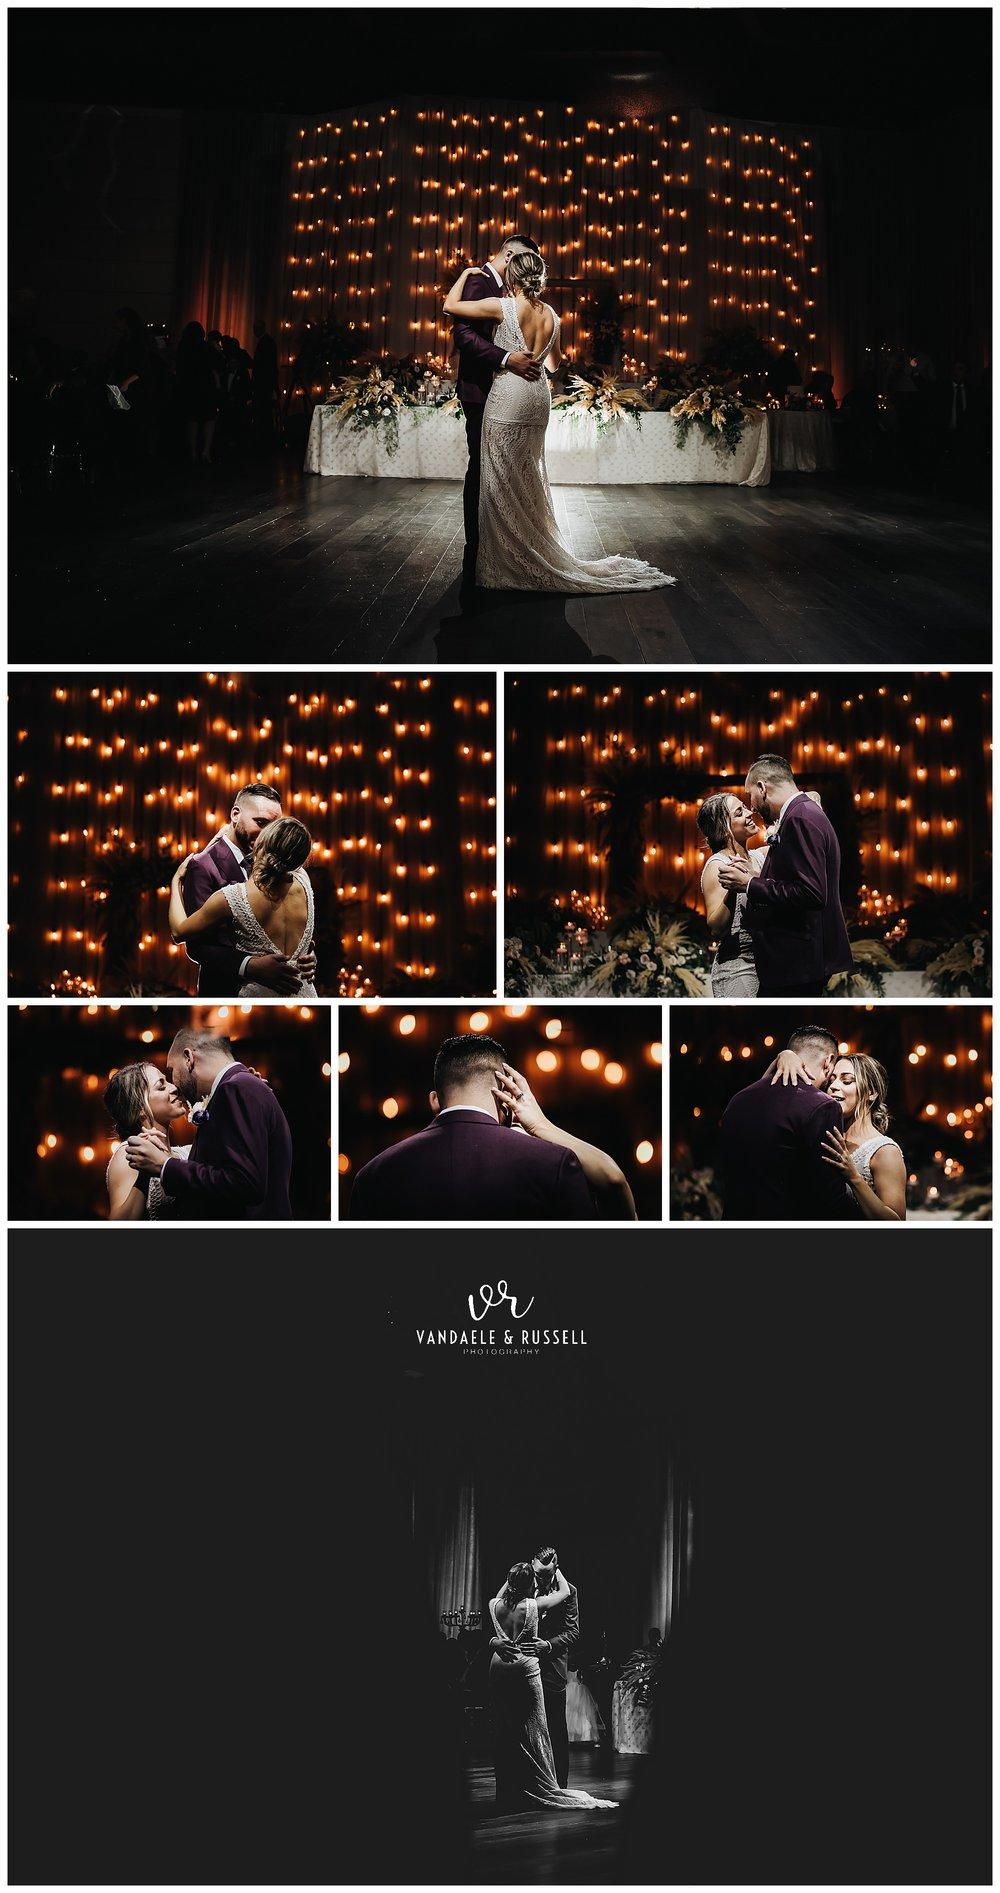 Joanna-Christos-Grand-Luxe-Wedding-Photos-Mint-Room-Toronto-VanDaele-Russell_0101.jpg